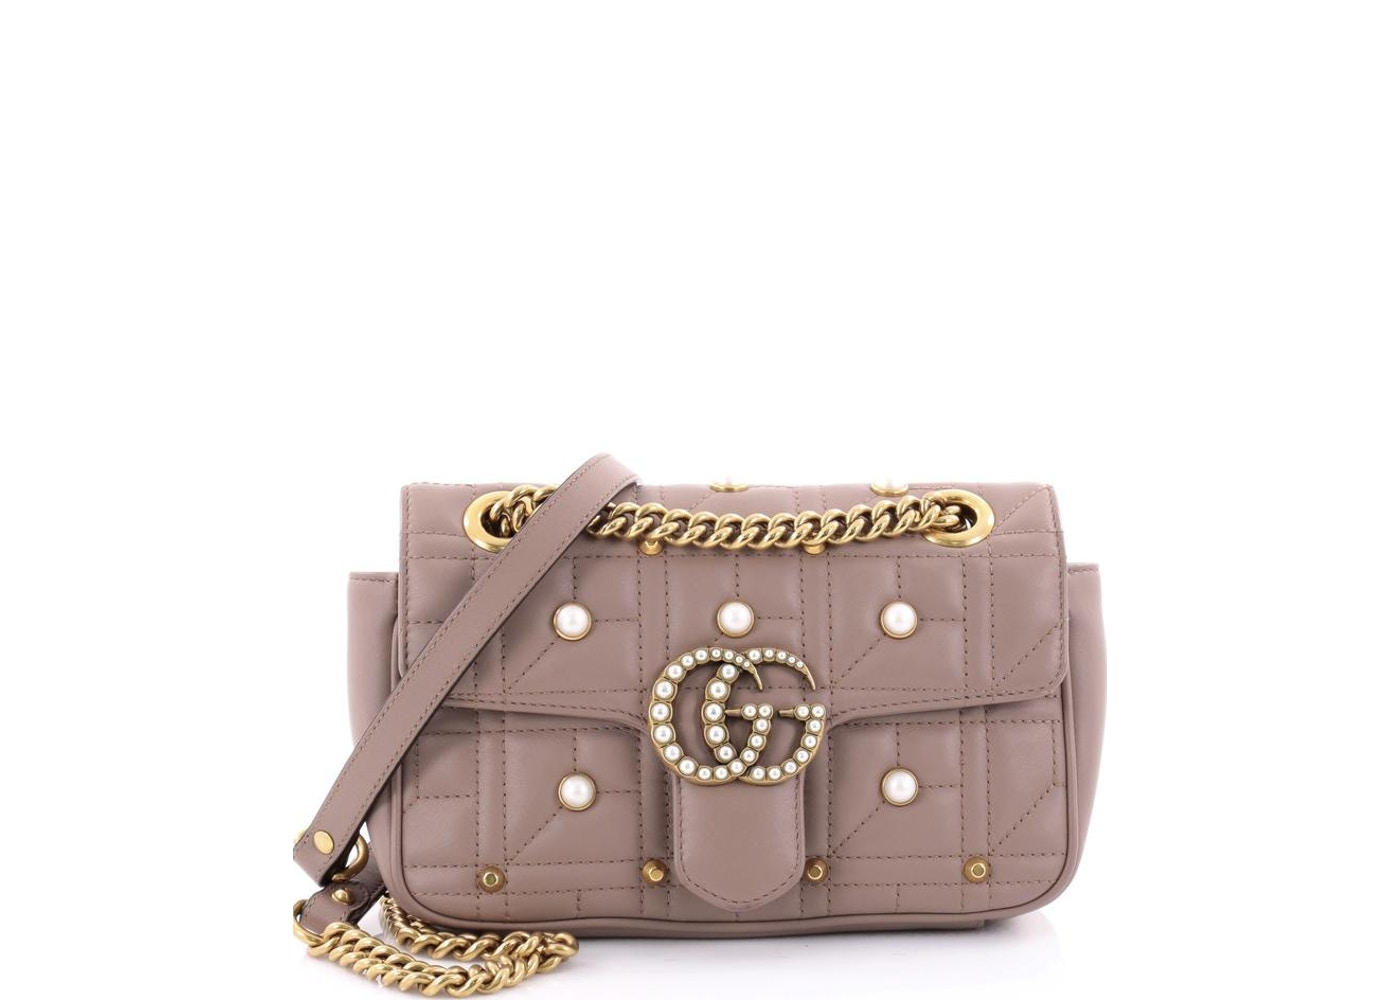 755eb442417c Gucci Flap Marmont Matelasse Pearly Mini Dusty Pink. Matelasse Pearly Mini  Dusty Pink